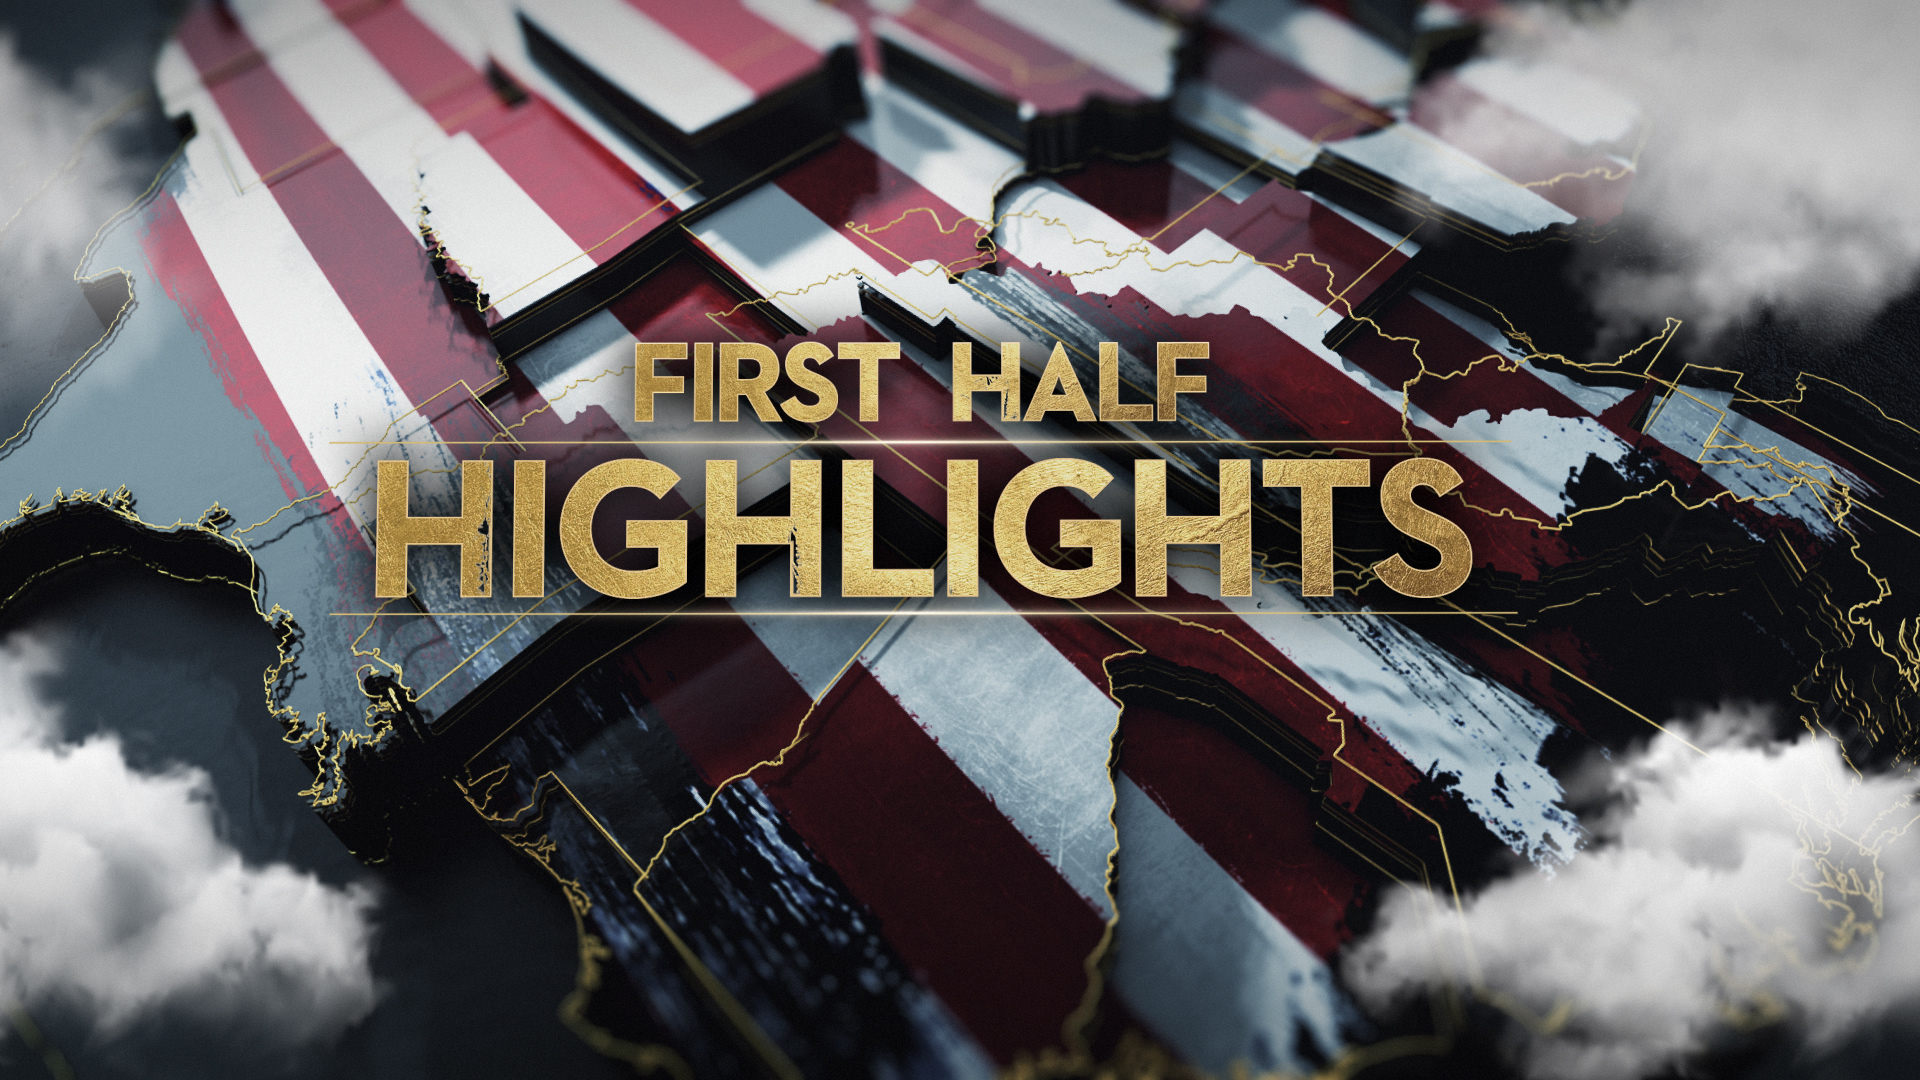 170707_ESPN_FIRSTHALF_HIGHLIGHTS_FE_02_3.jpg